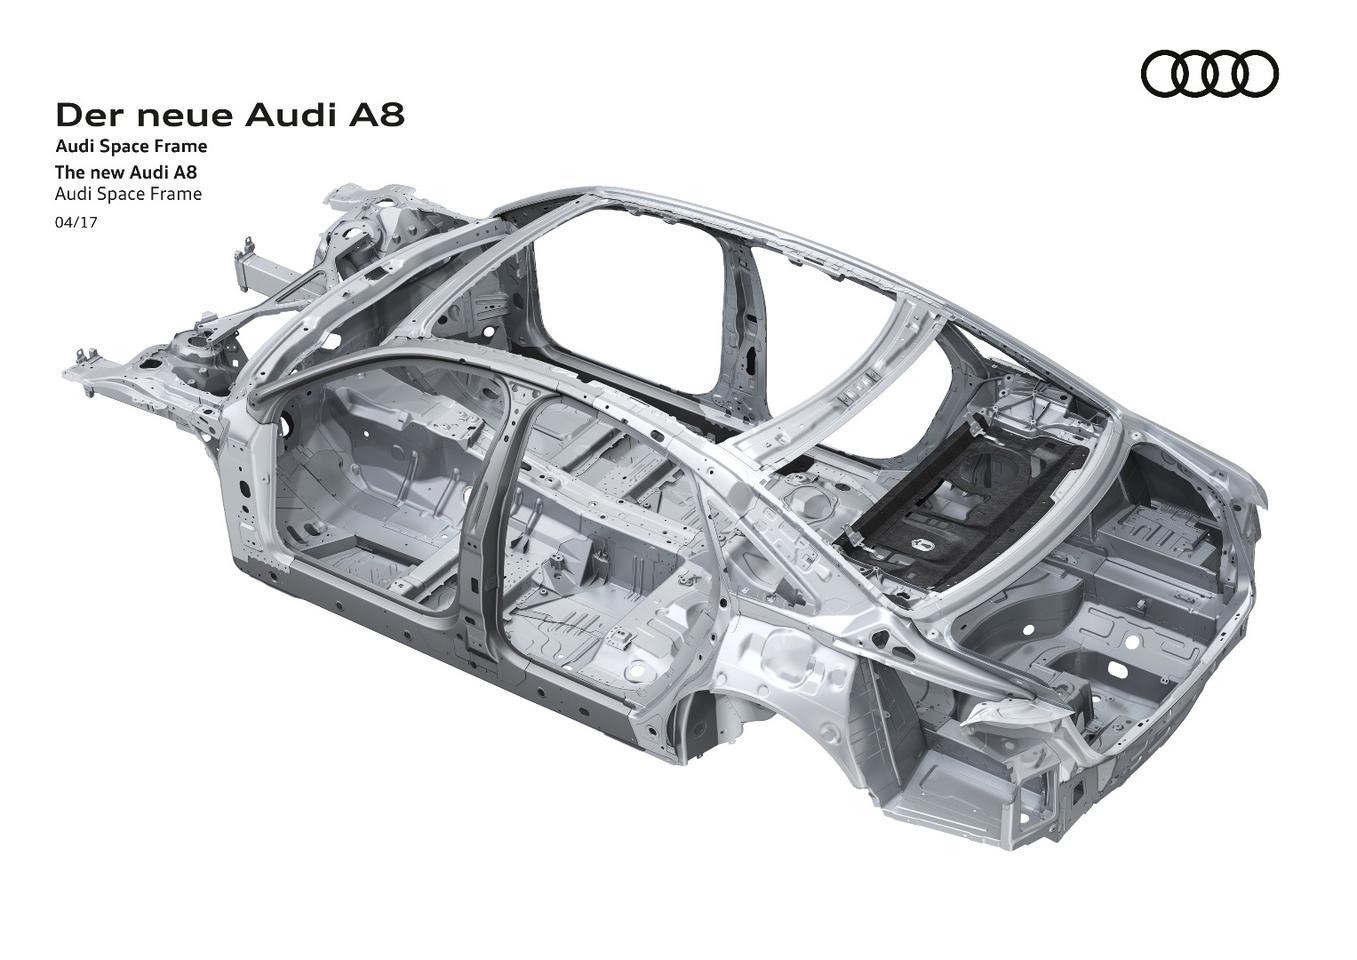 New Audi A8 creates a brilliant harmony of style, tech and